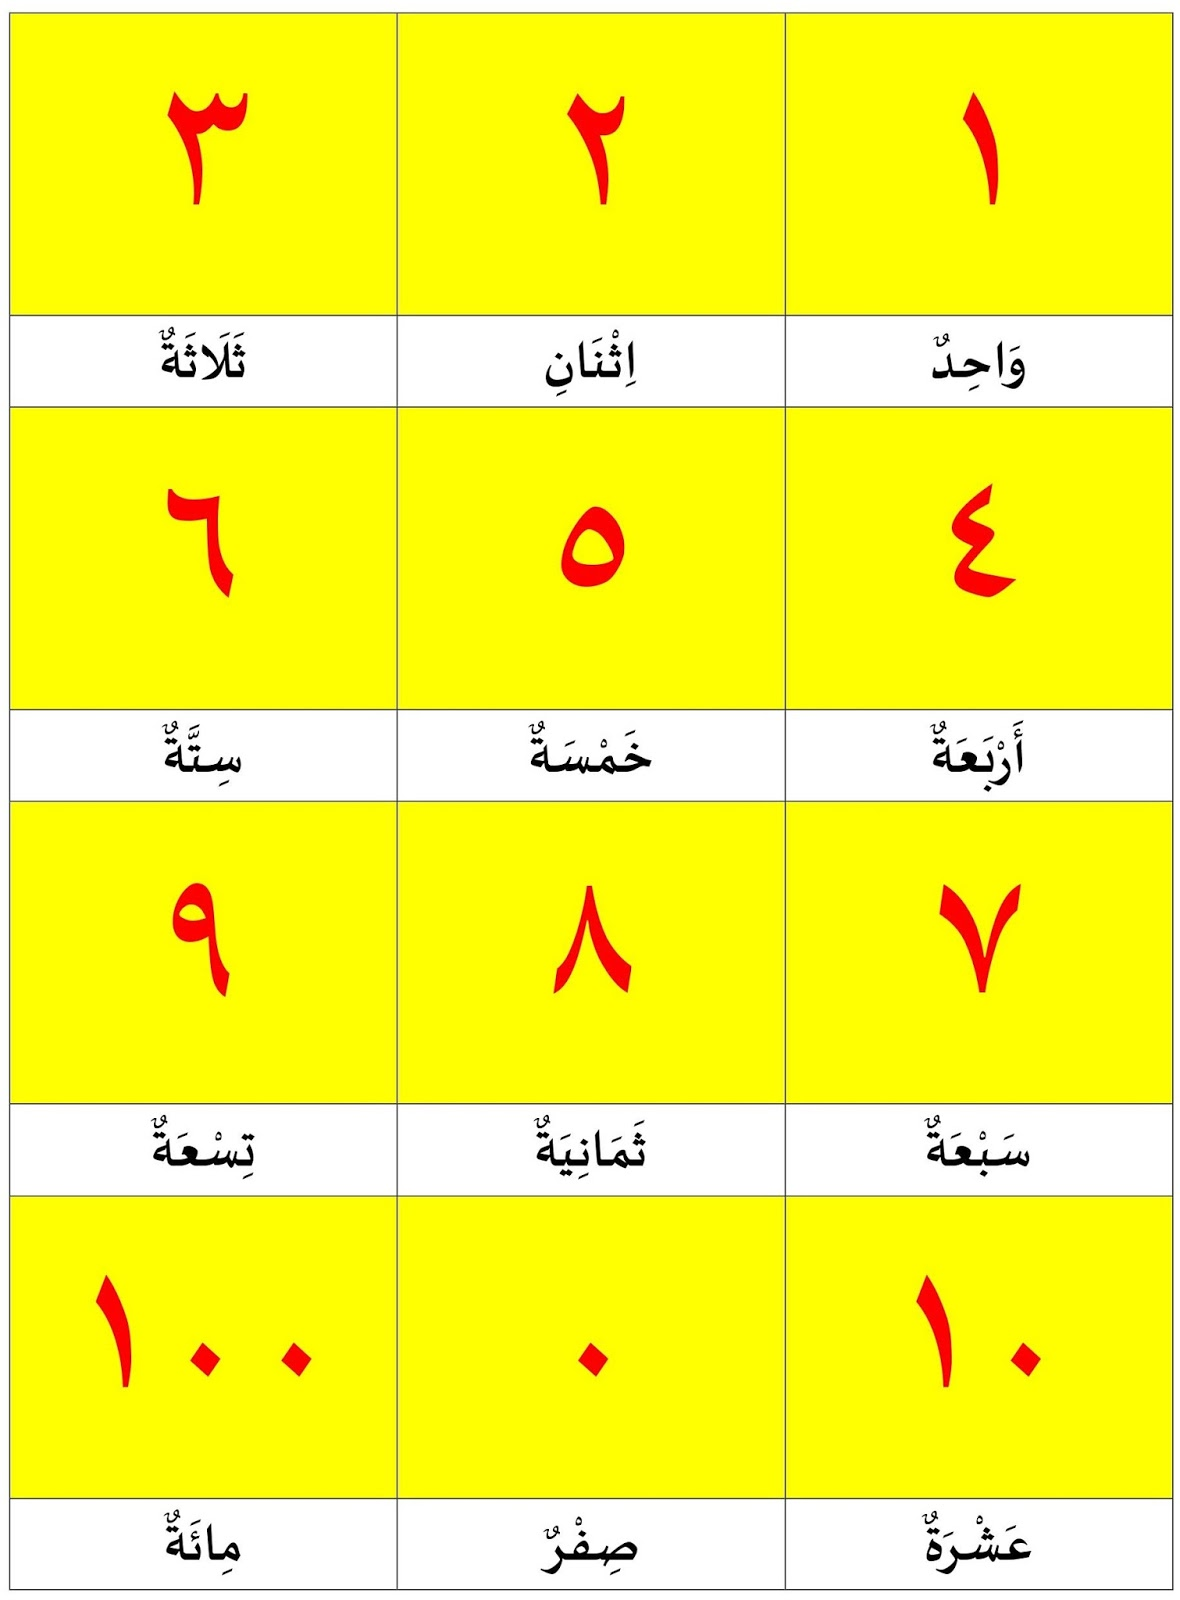 Belajar Bahasa Arab Bilangan Angka 1 100 Belajar Bahasa Arab